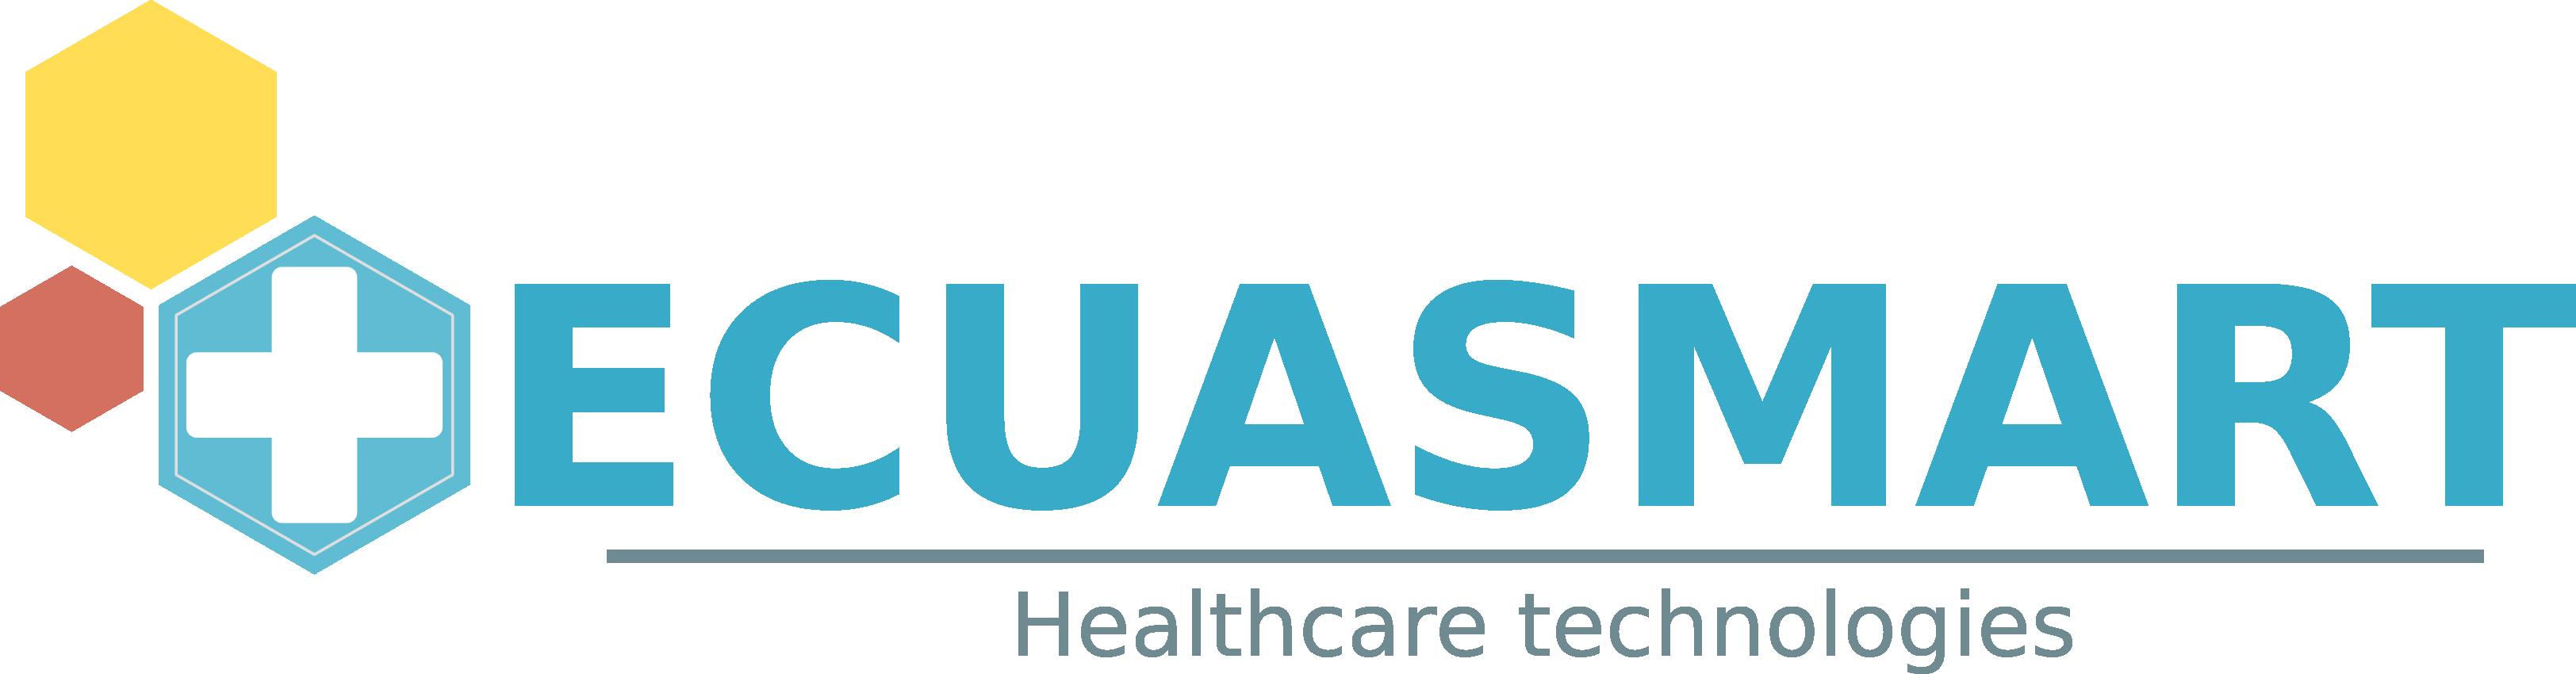 Ecuasmart Healthcare S.A.